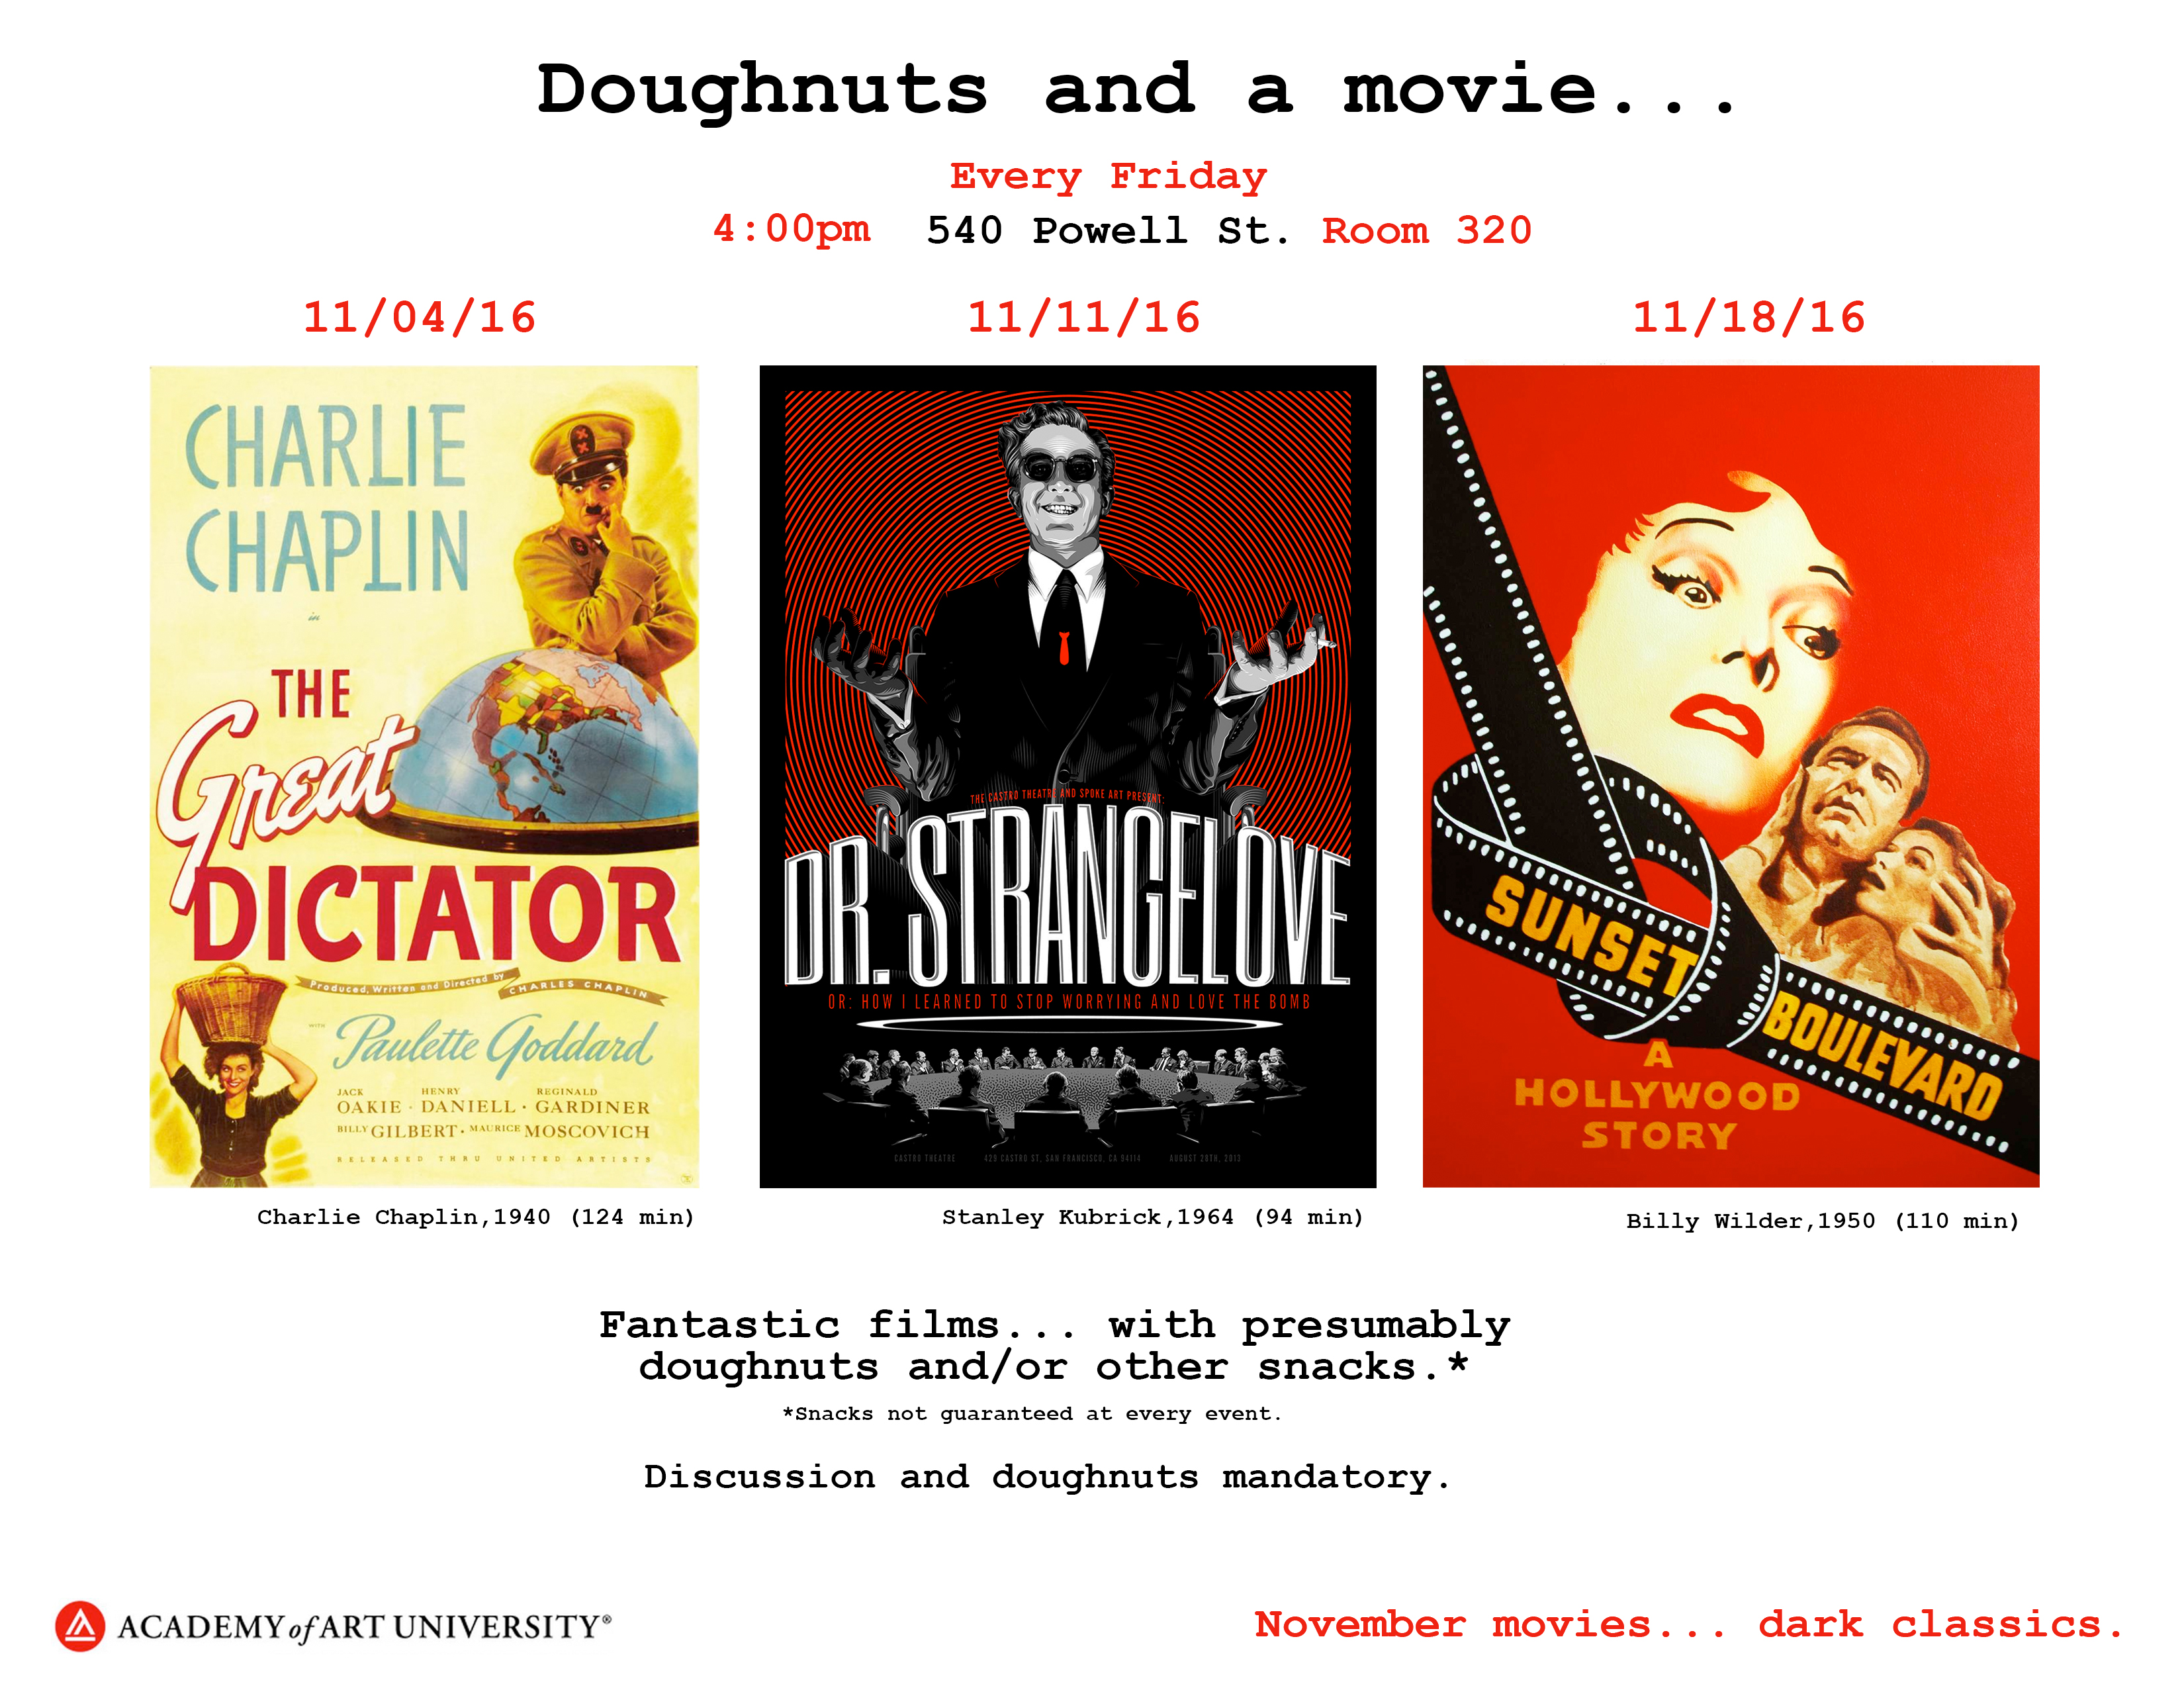 doughnuts_and_movie-horizontal-november